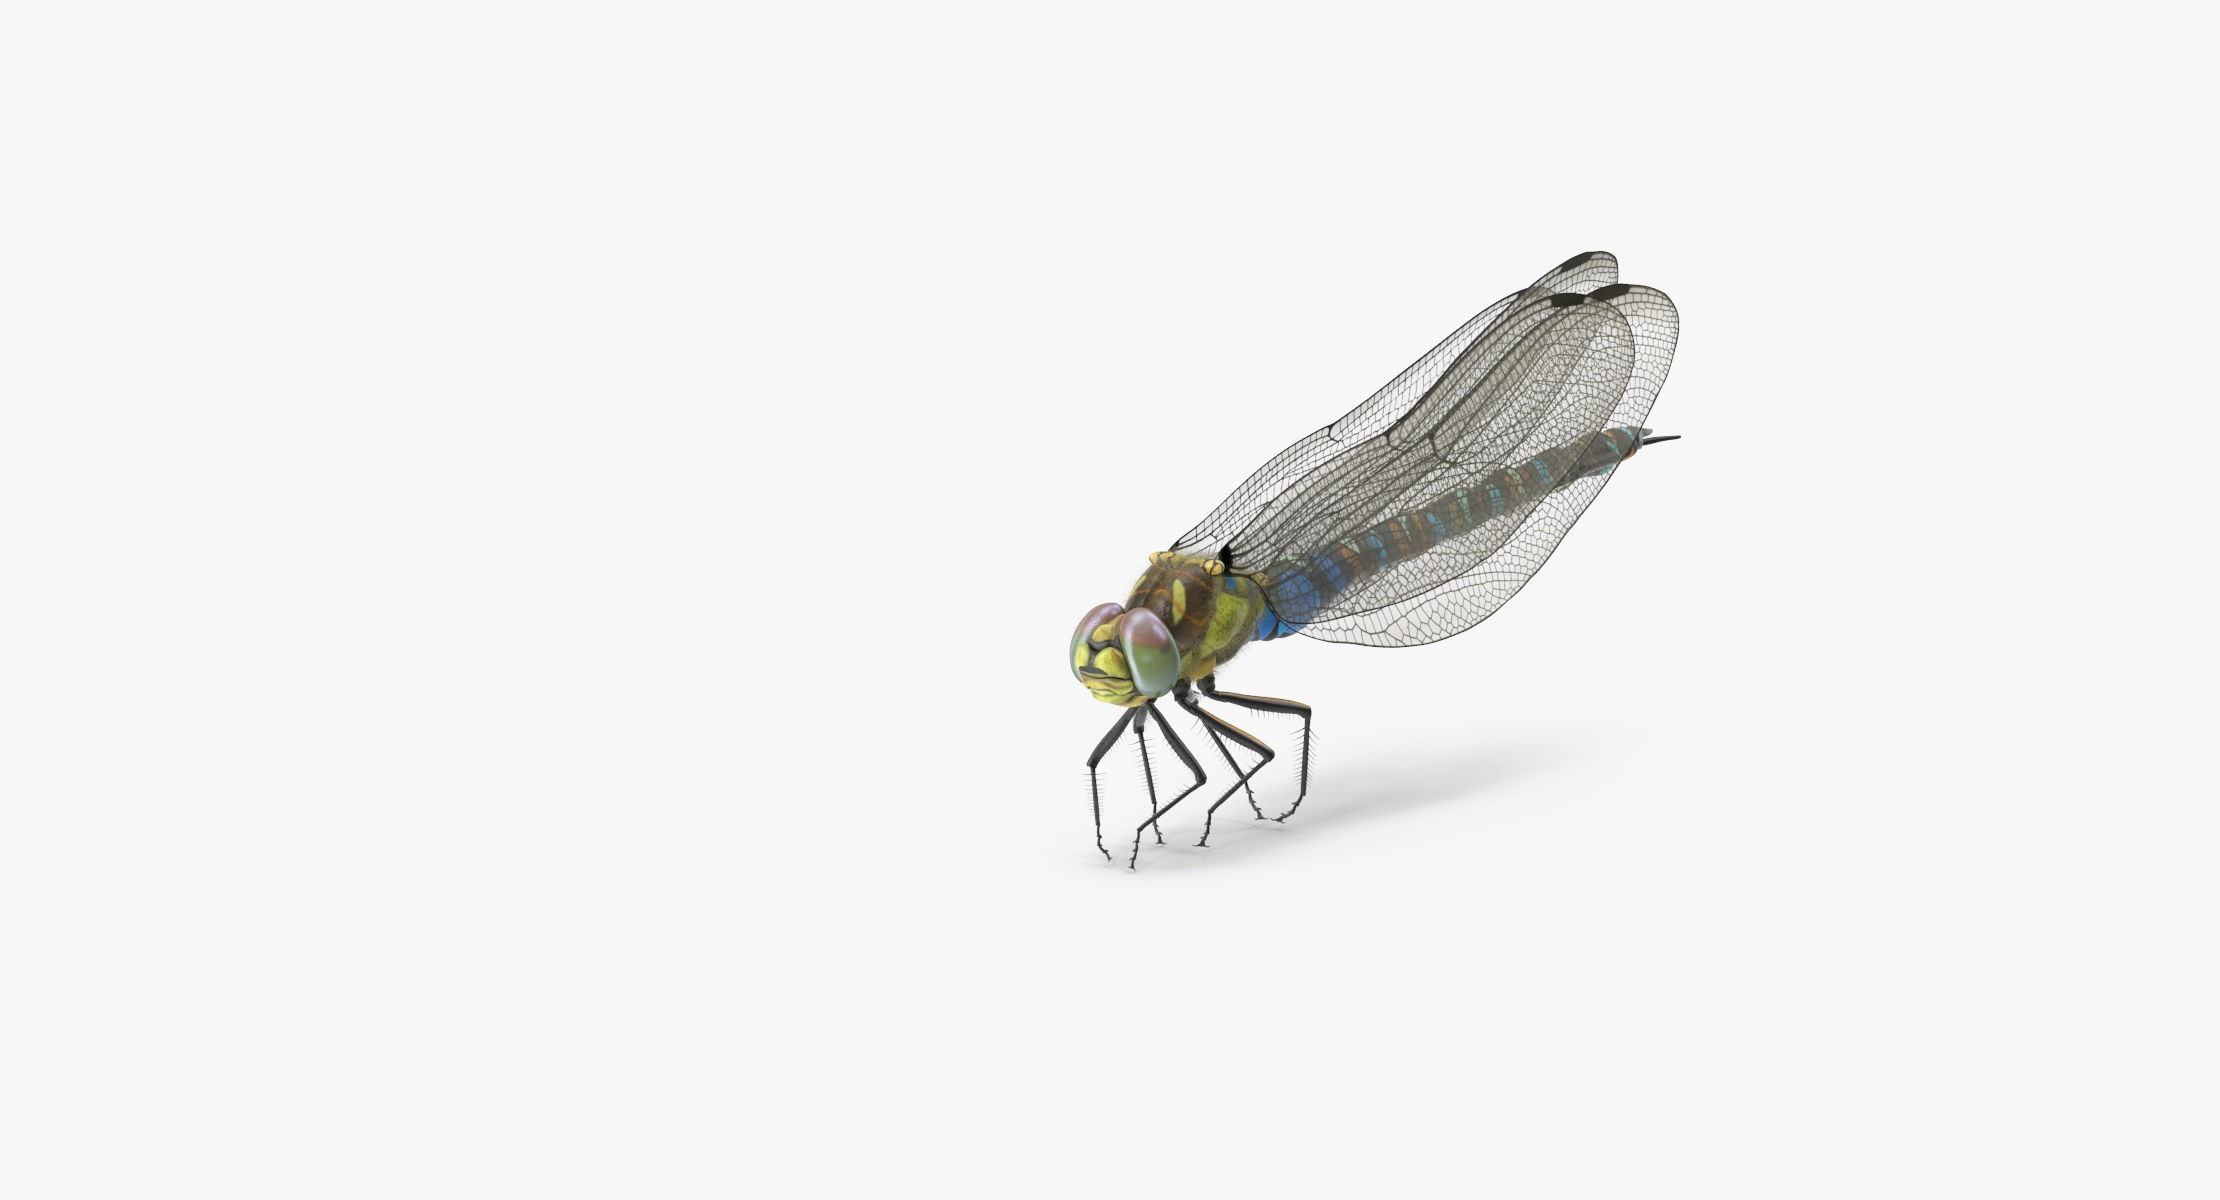 Dragonfly Pose 03 - reel 1